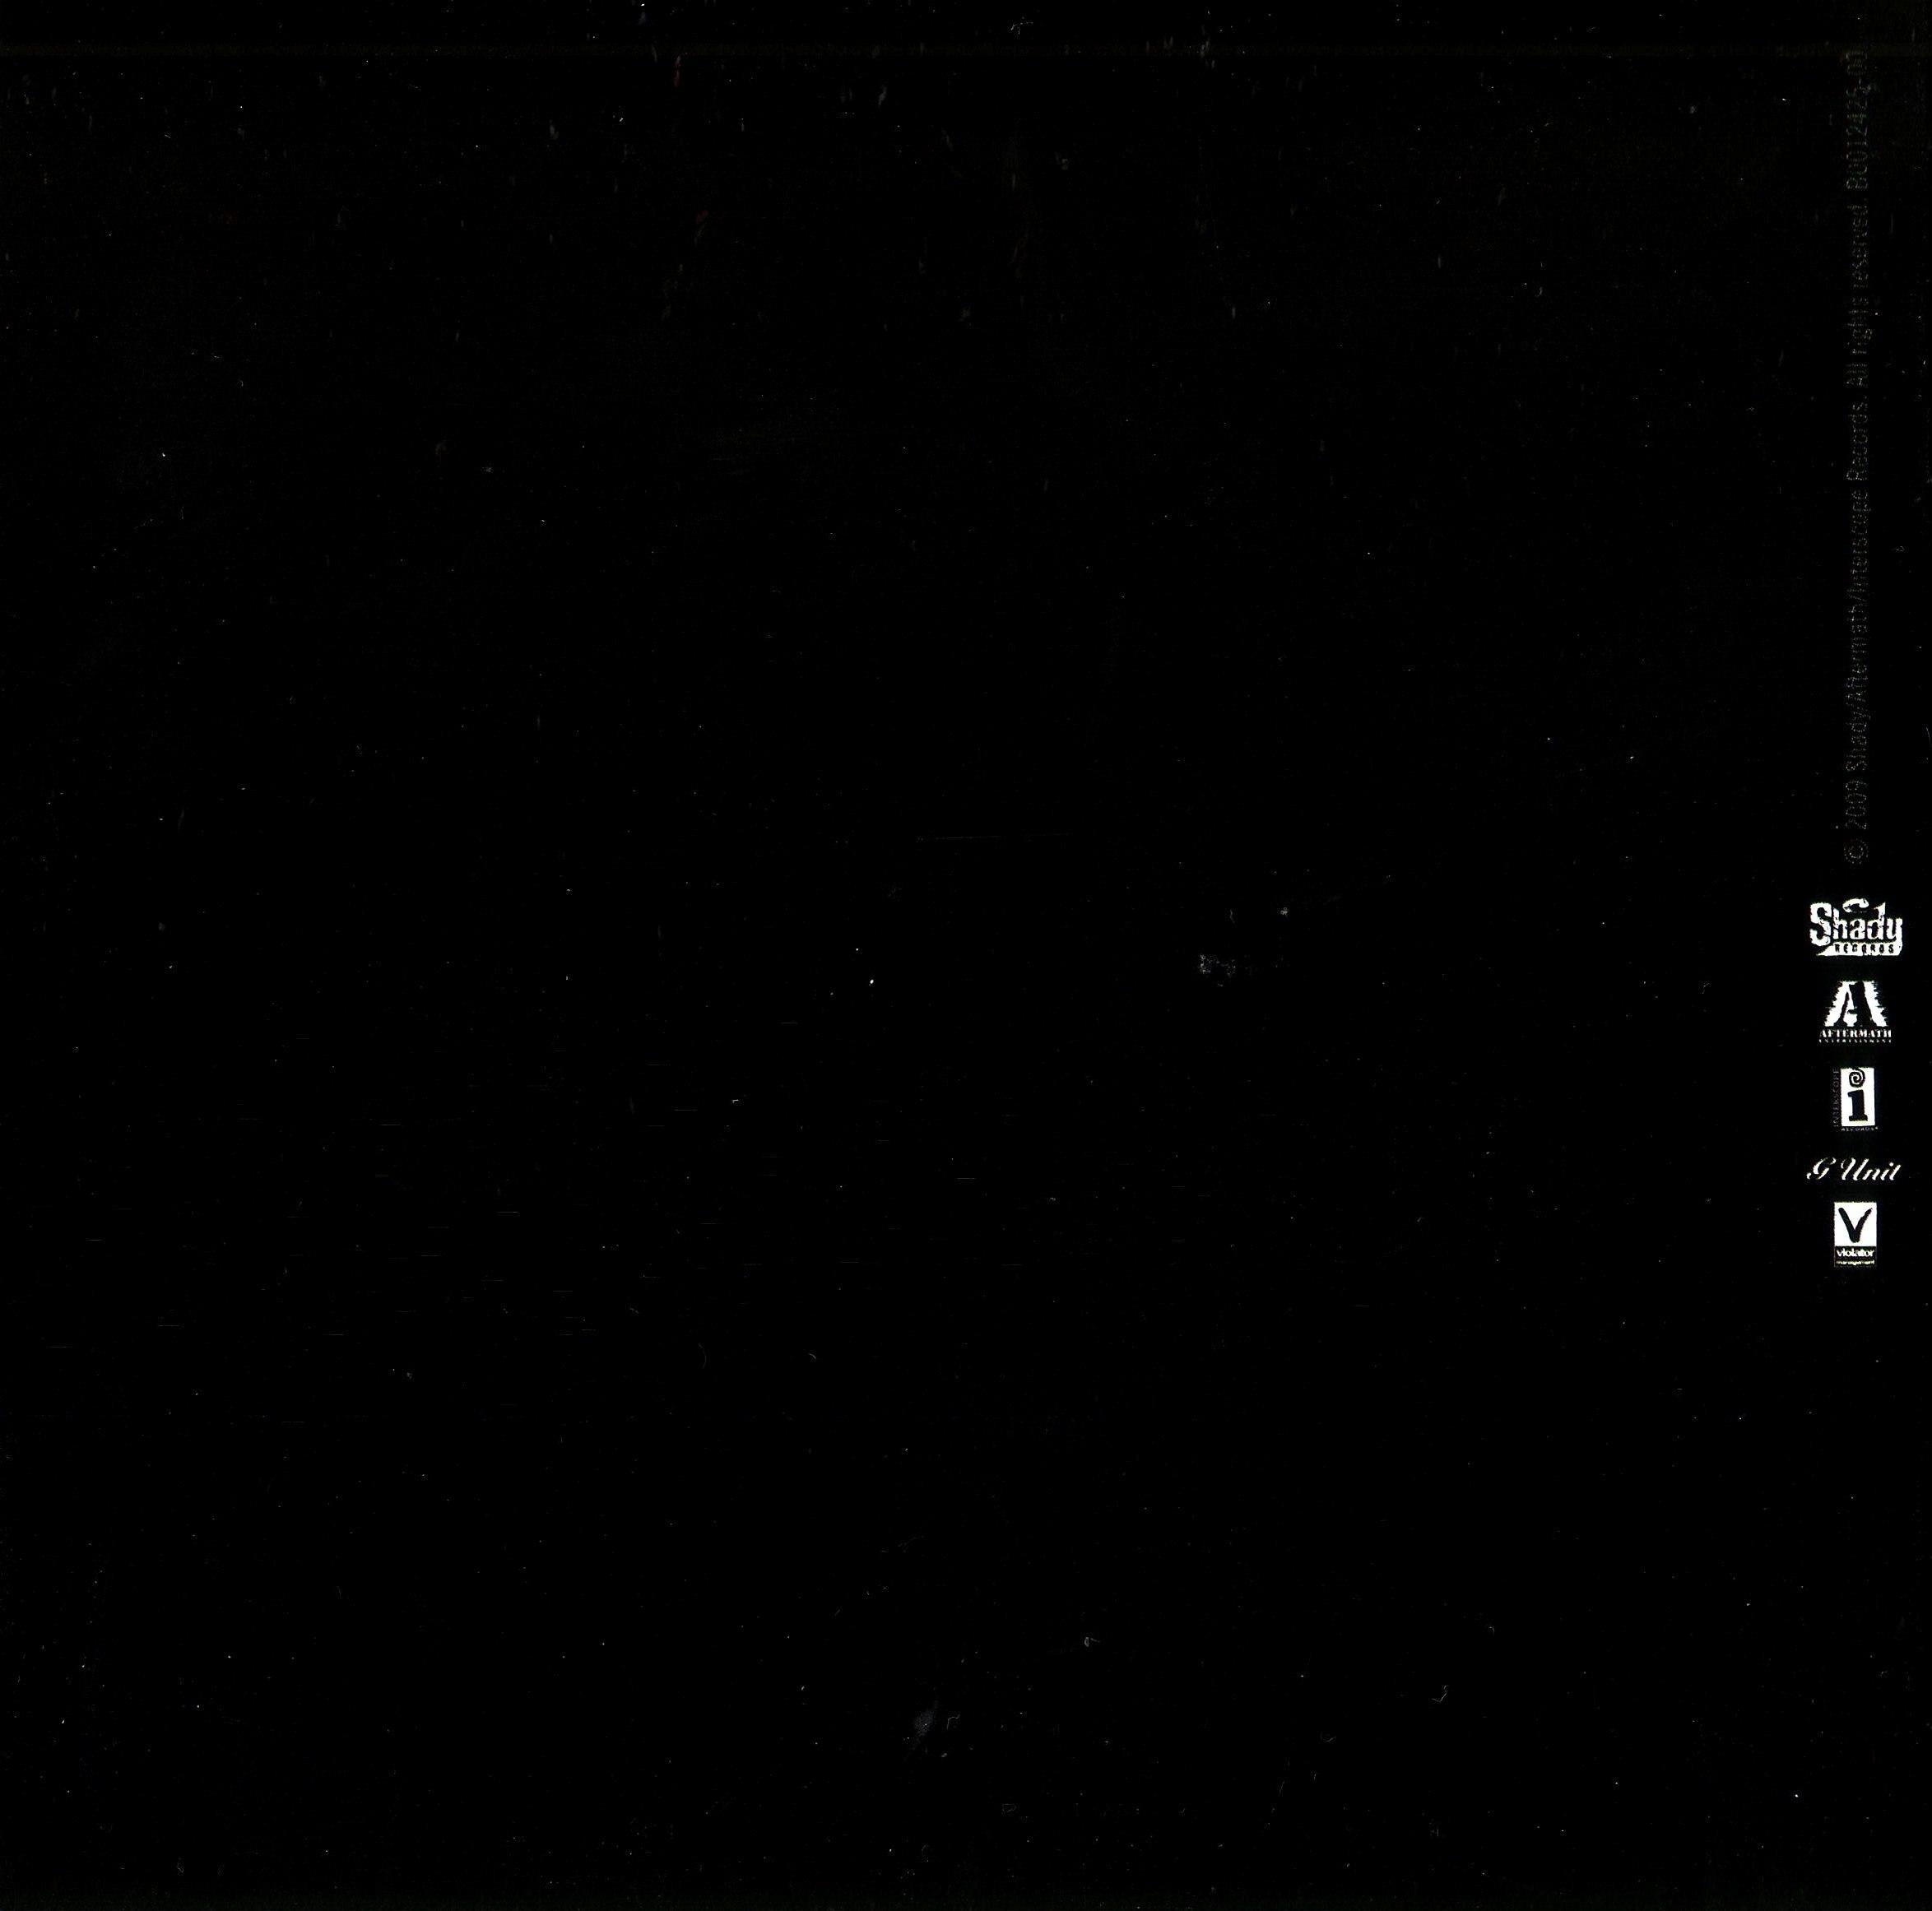 Copertina cd 50 Cent - Before I Self Destruct - Inside ...